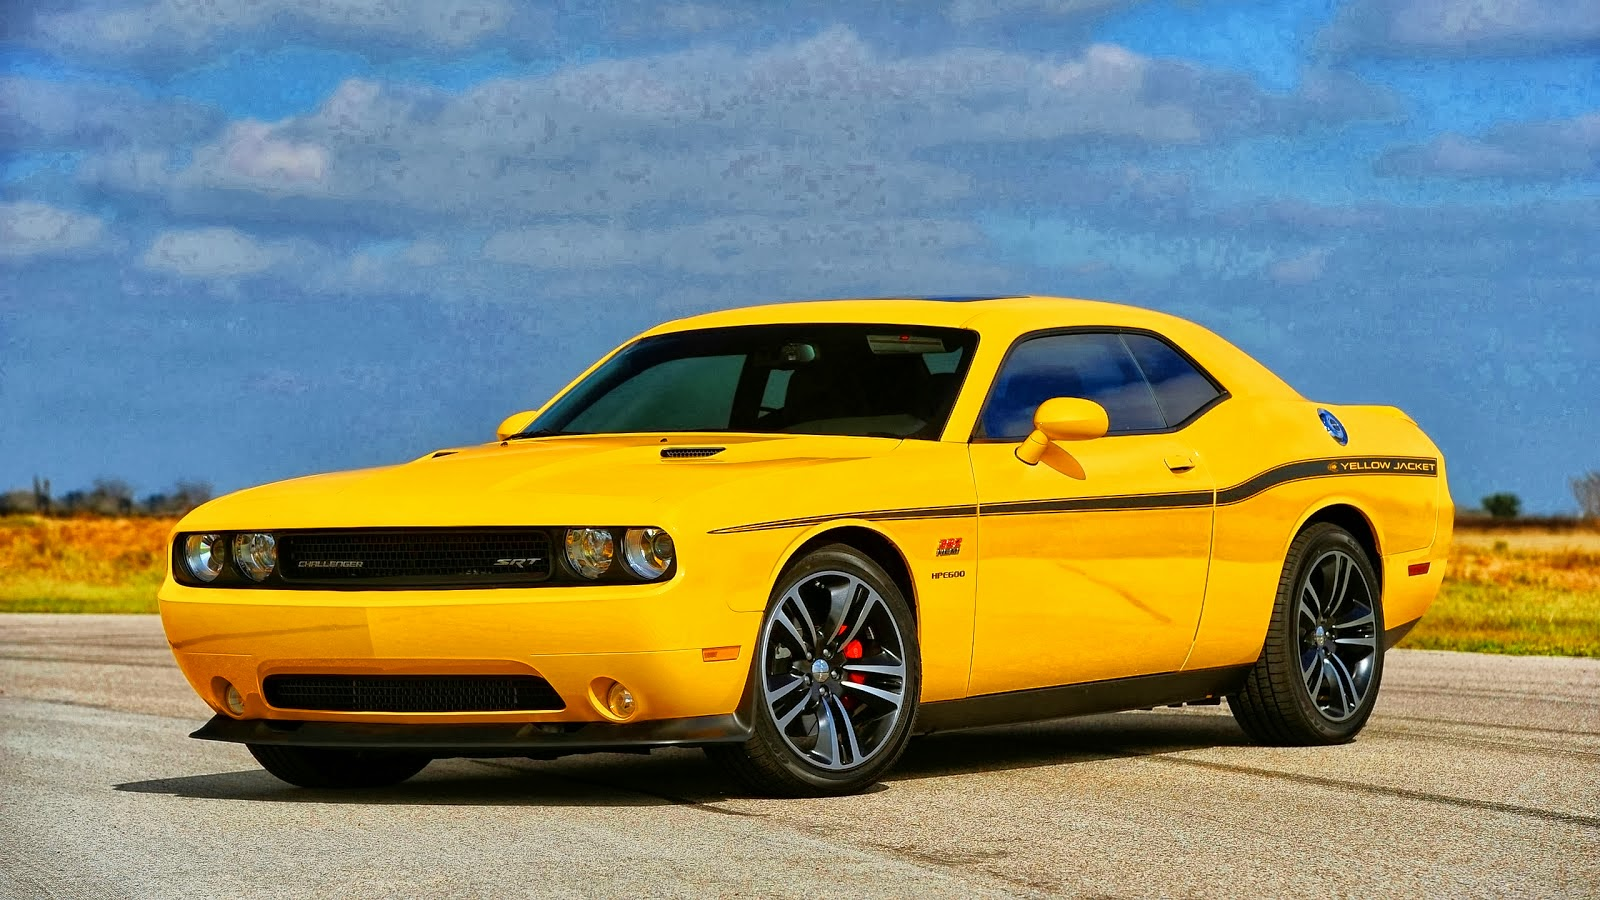 2013 Dodge Challenger392 Hemi Yellow | Autos Weblog